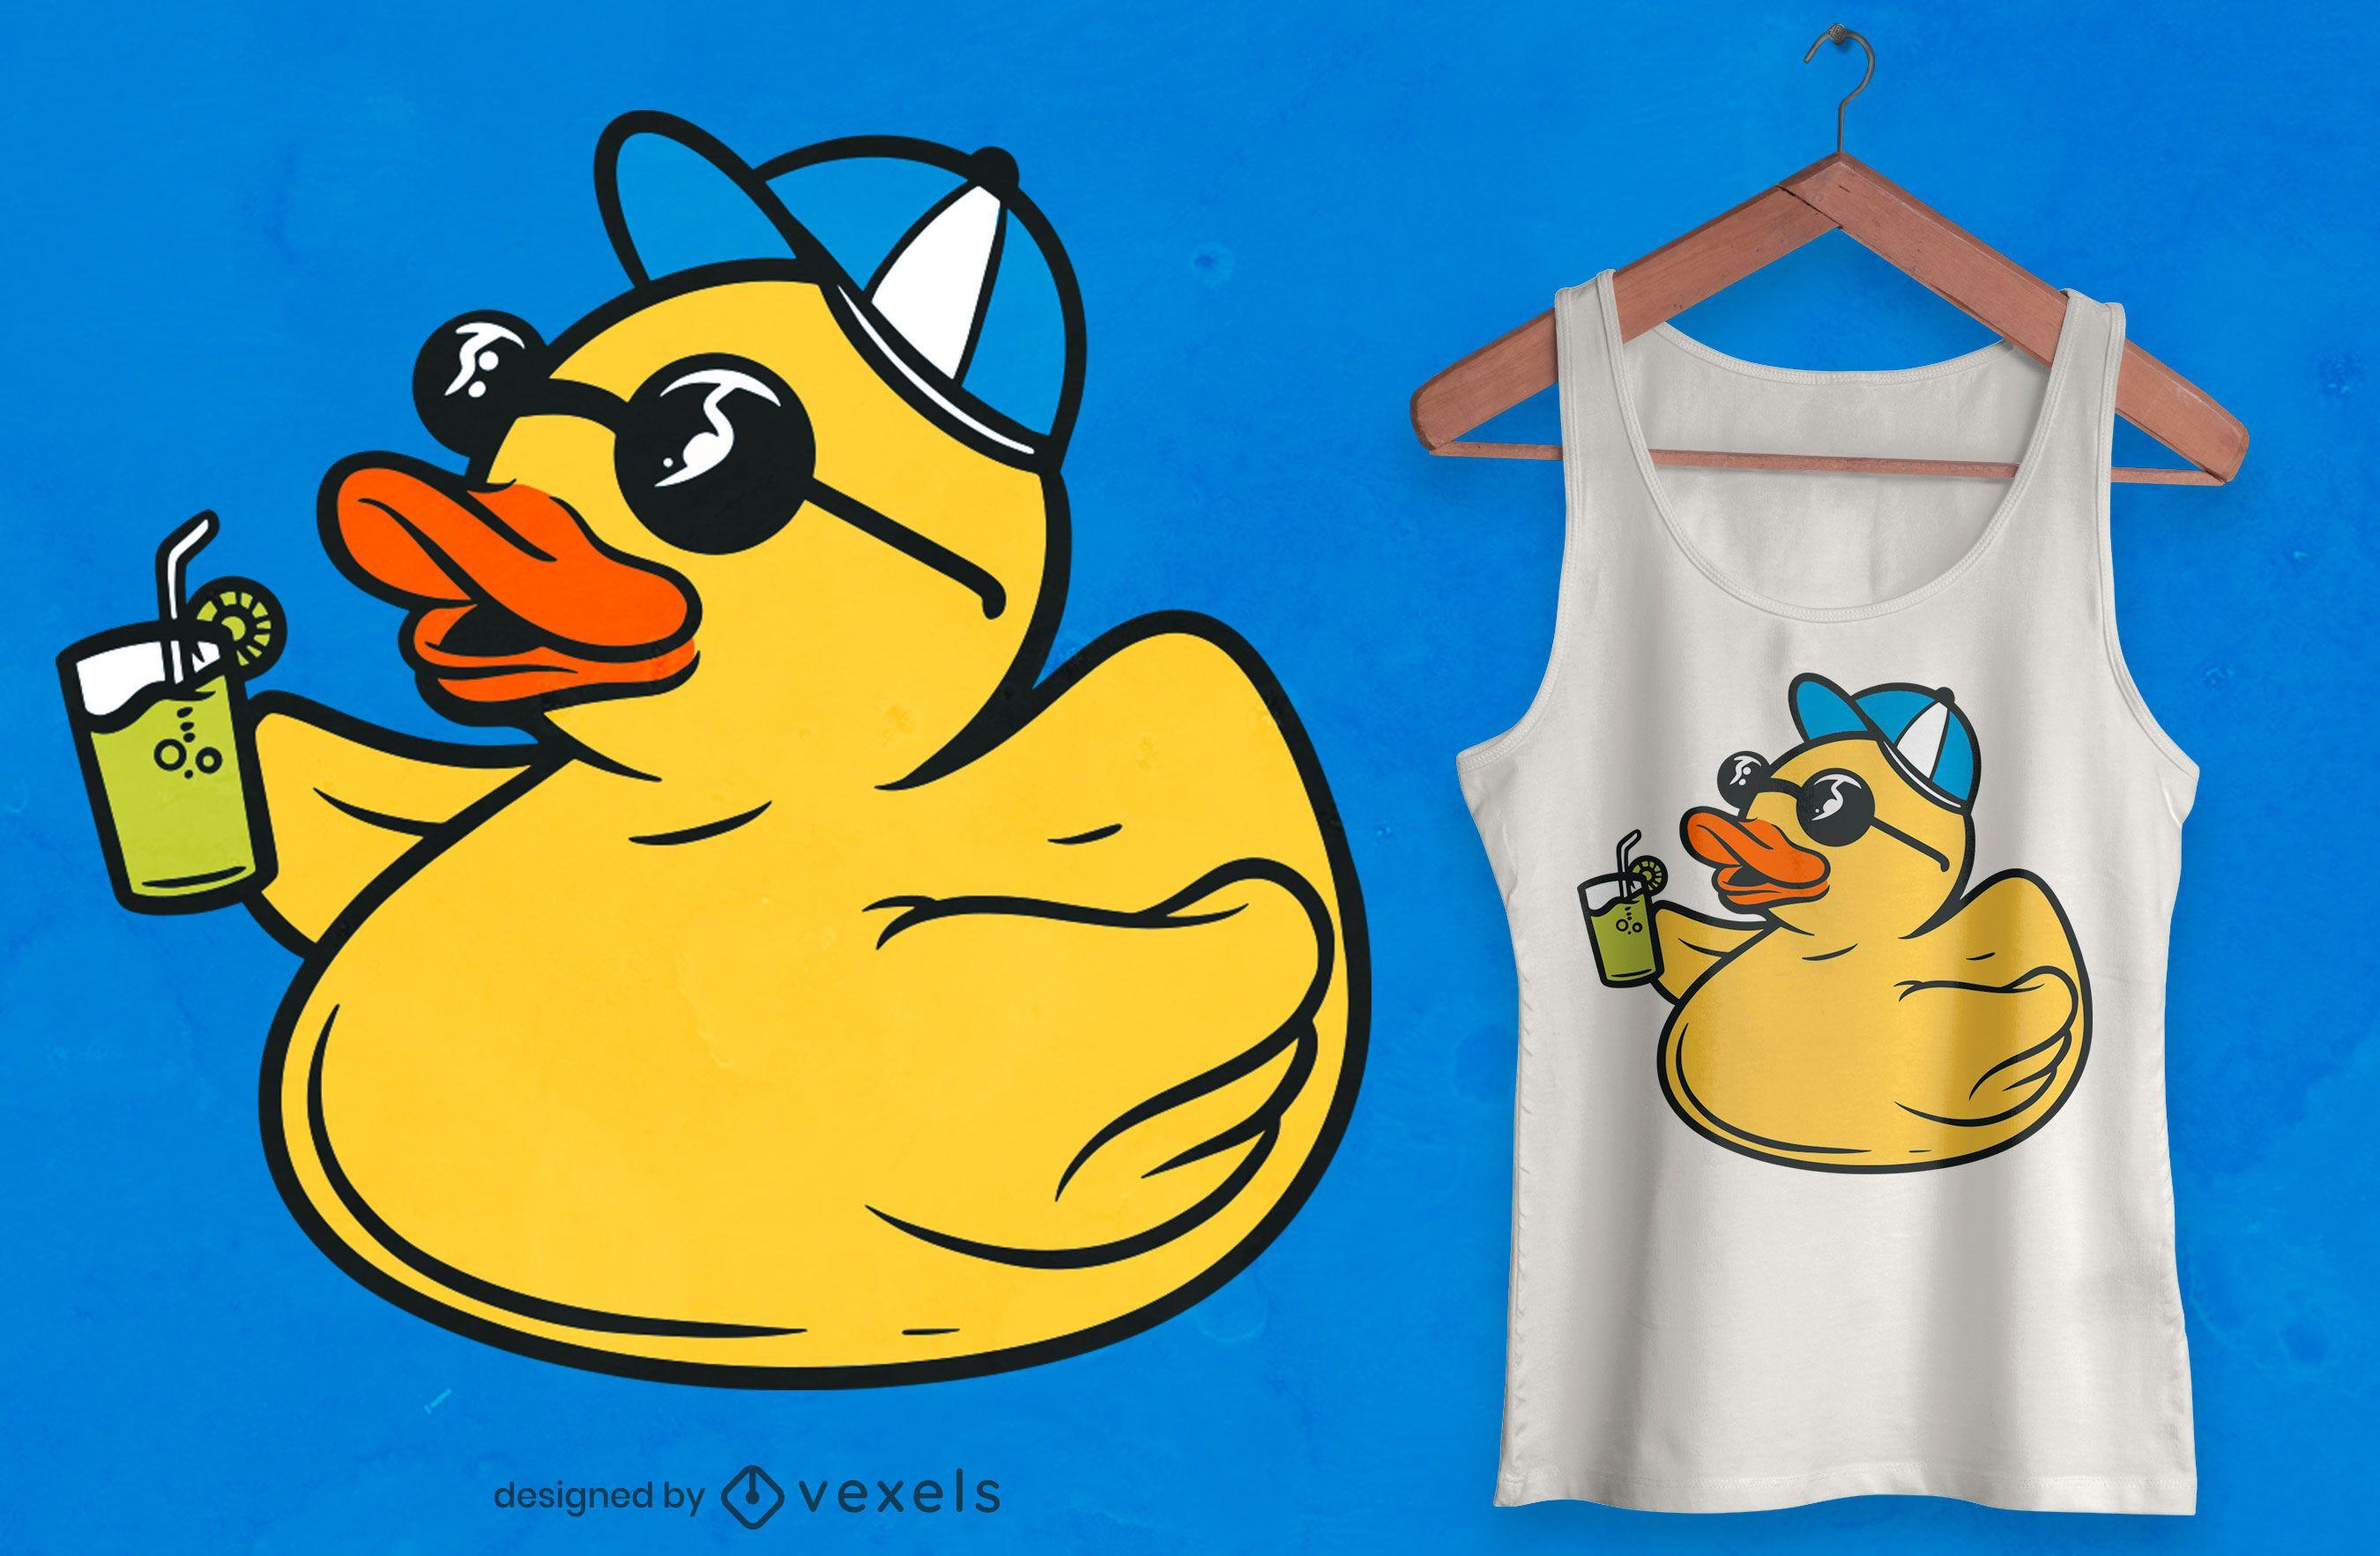 Party rubber duck t-shirt design